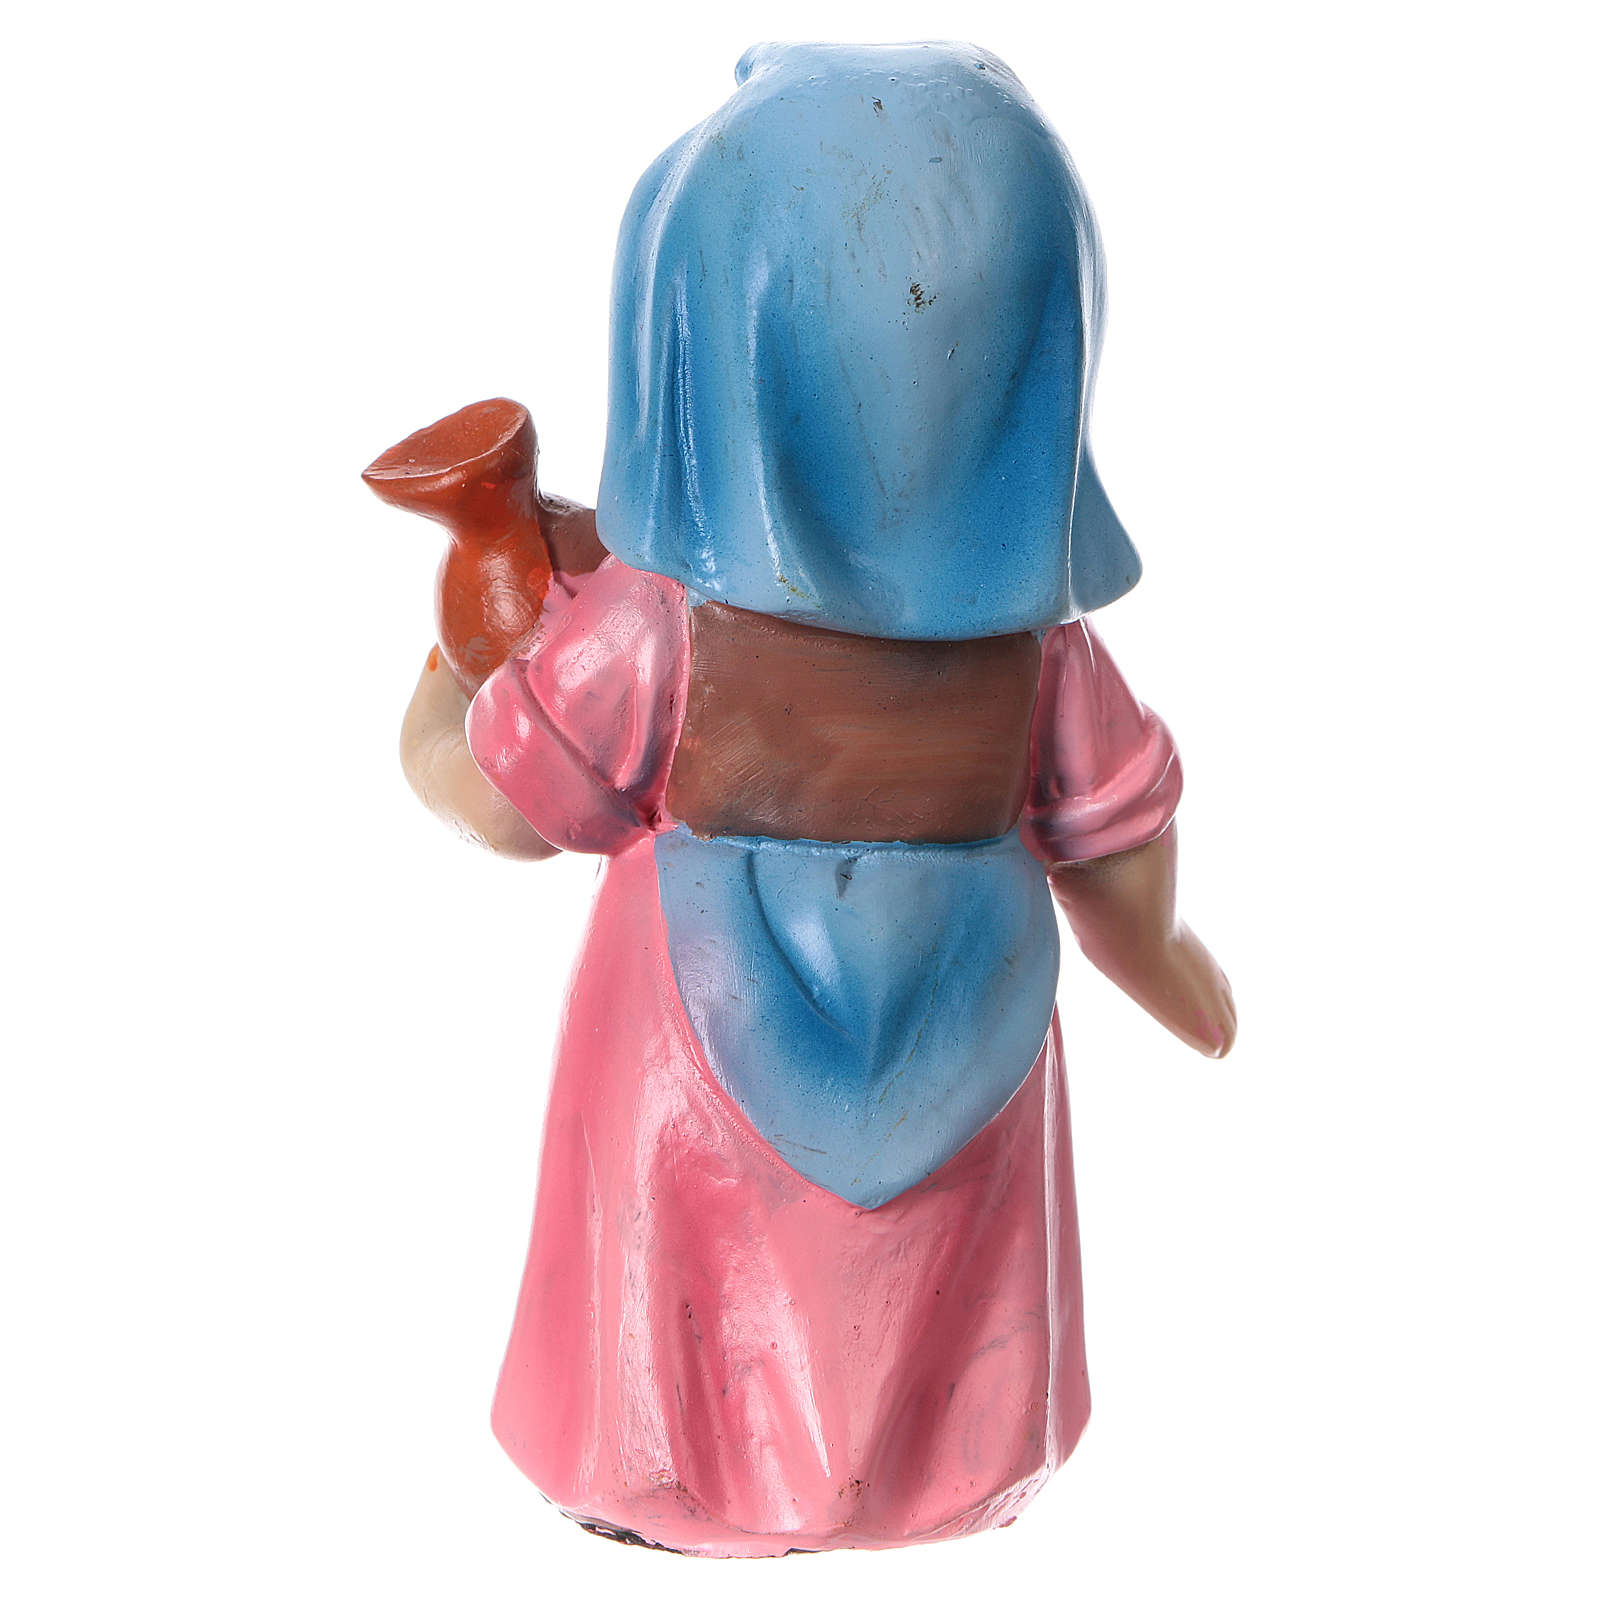 Statuina contadina con anfora linea bambino per presepi 9 cm 3